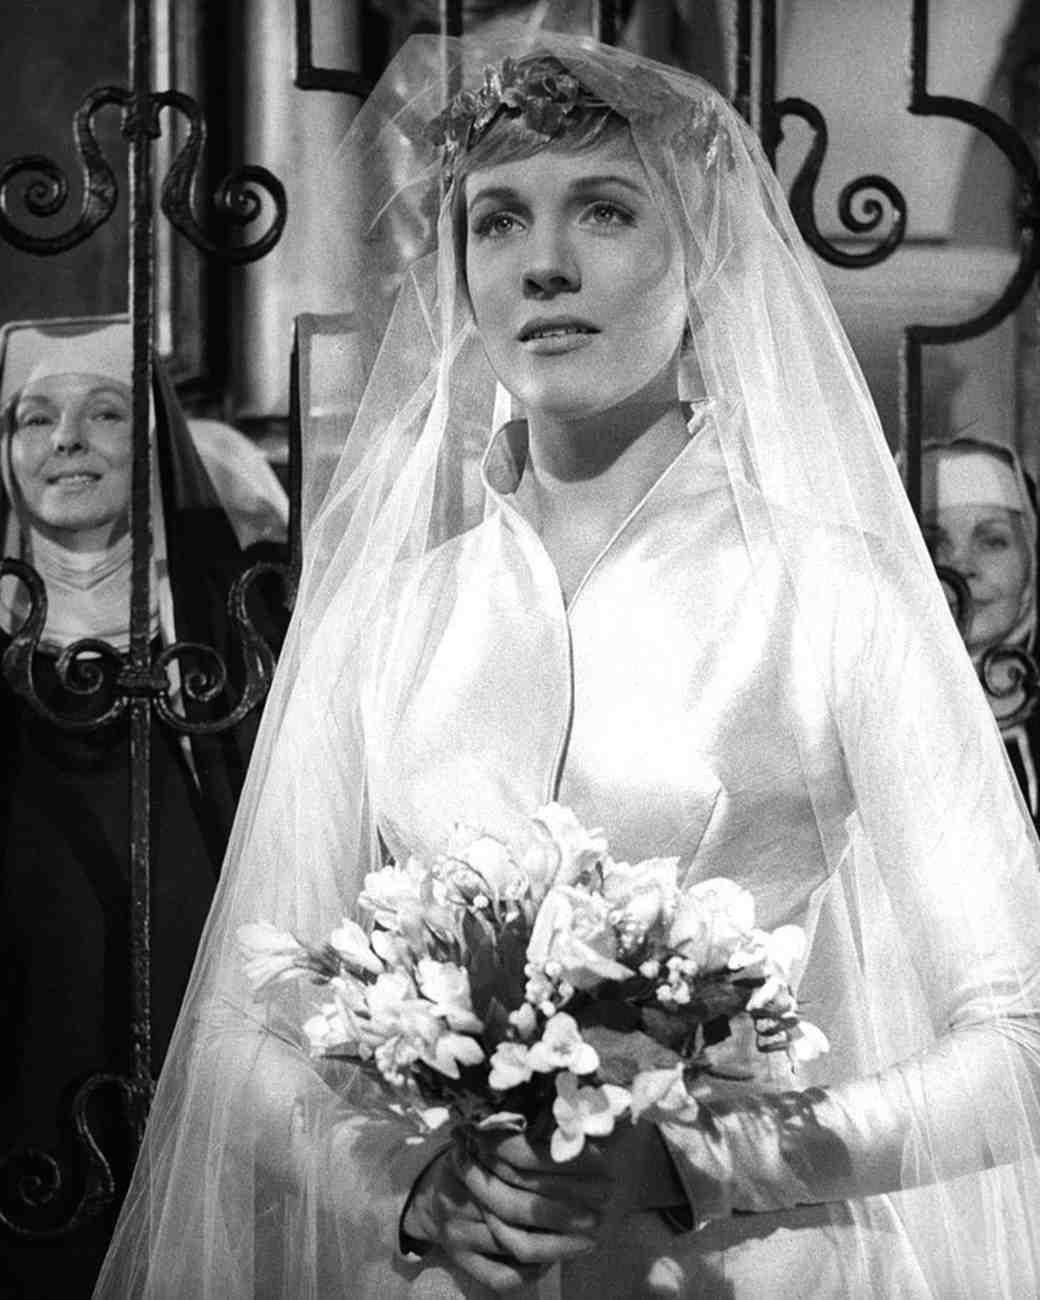 sound-of-music-wedding-dress-0515